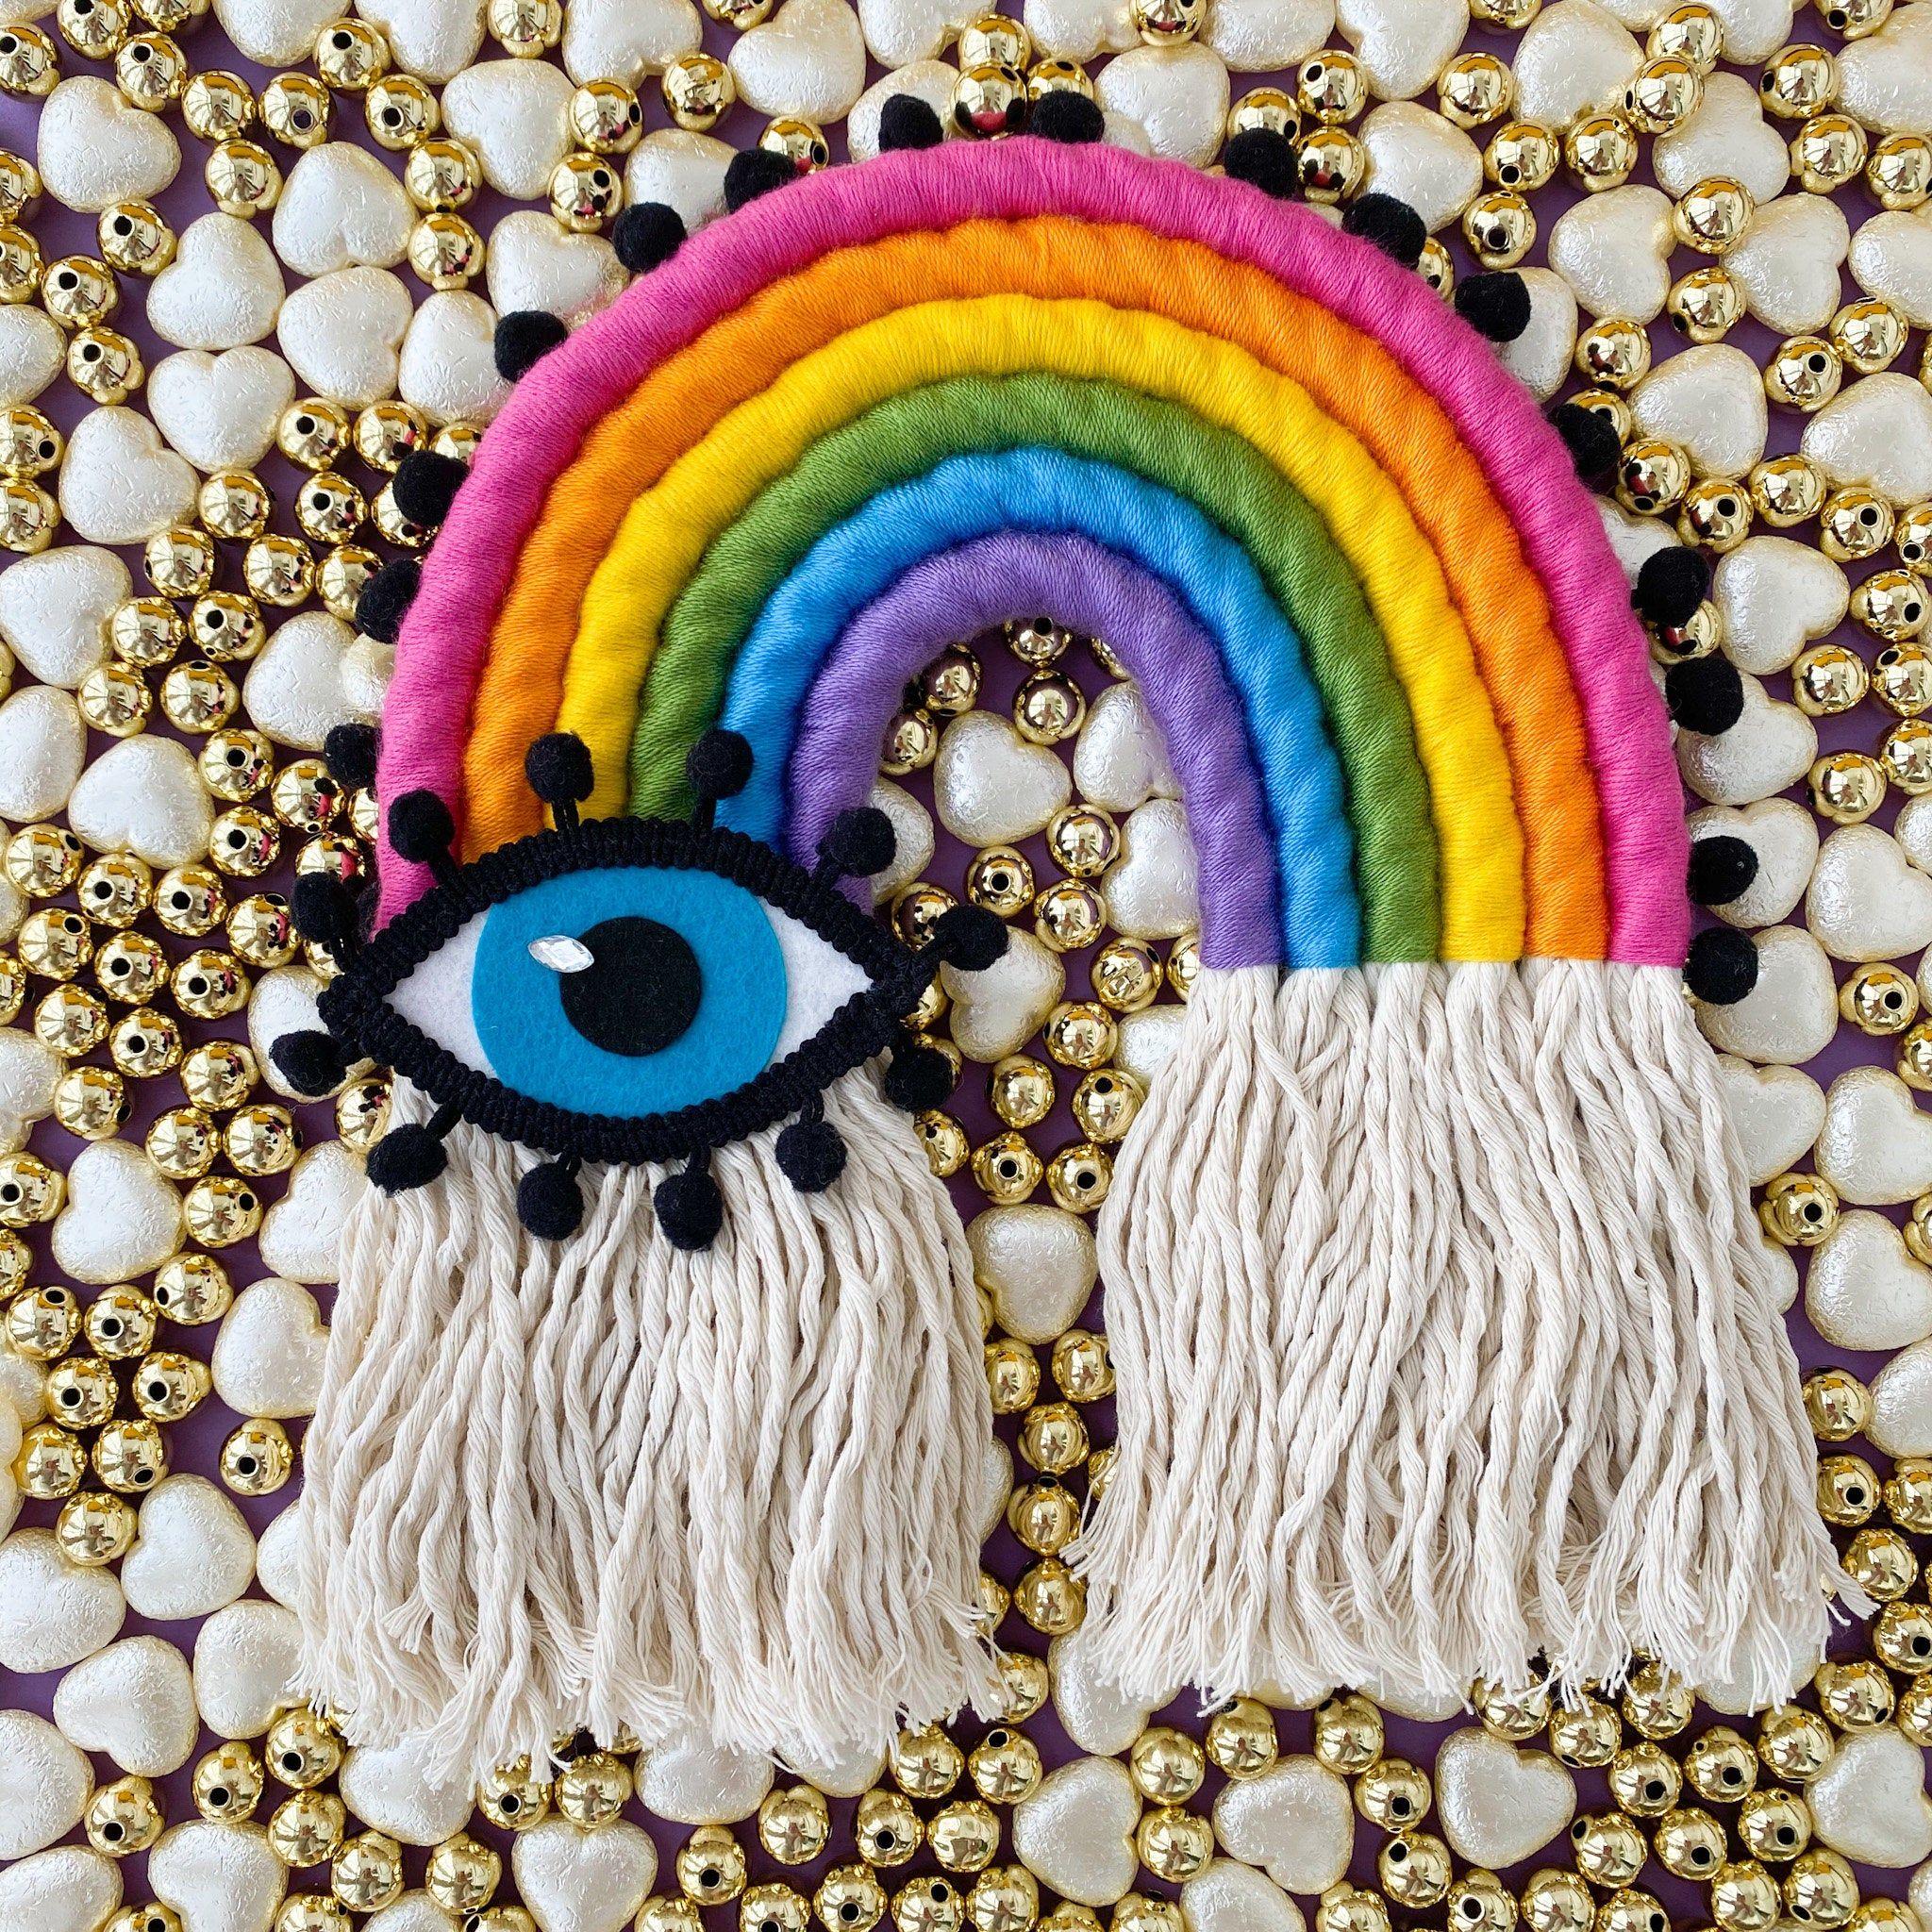 Modern Macrame Rainbow Evil Eye Wall Art Colorful Boho Home Etsy In 2020 Modern Macrame Boho Nursery Decor Colorful Boho